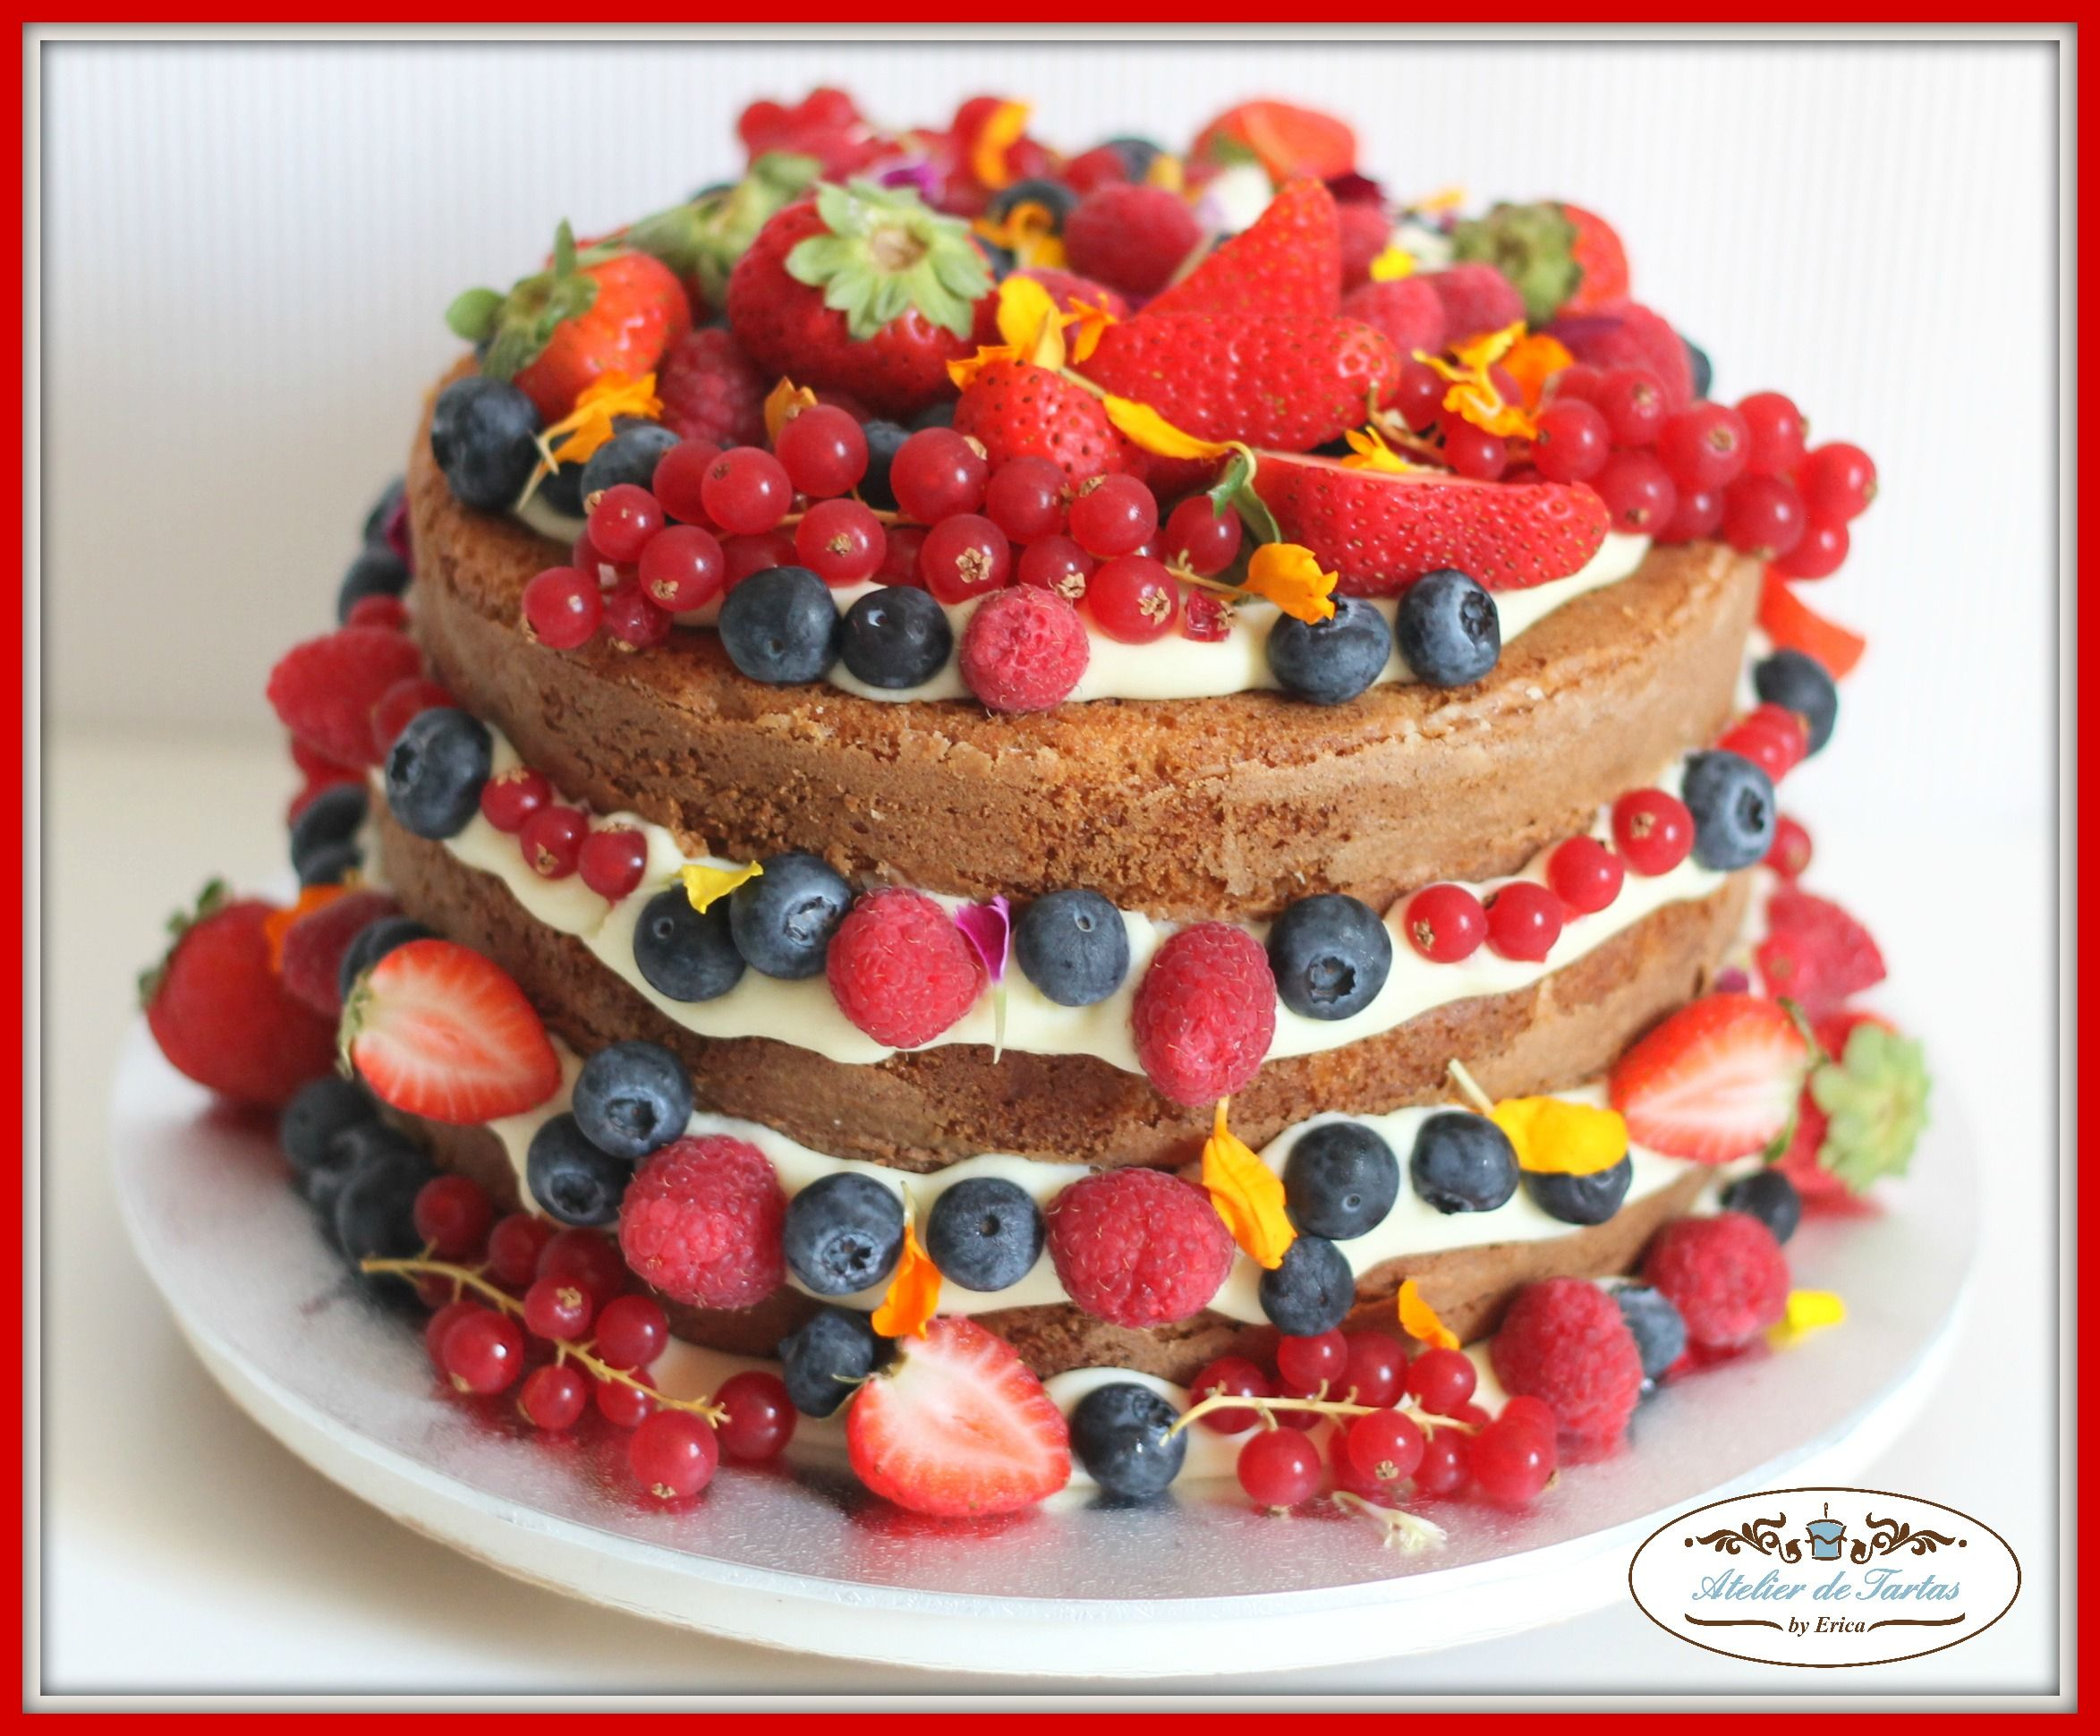 Super Jueves - Naked Cake de Frutos Rojos